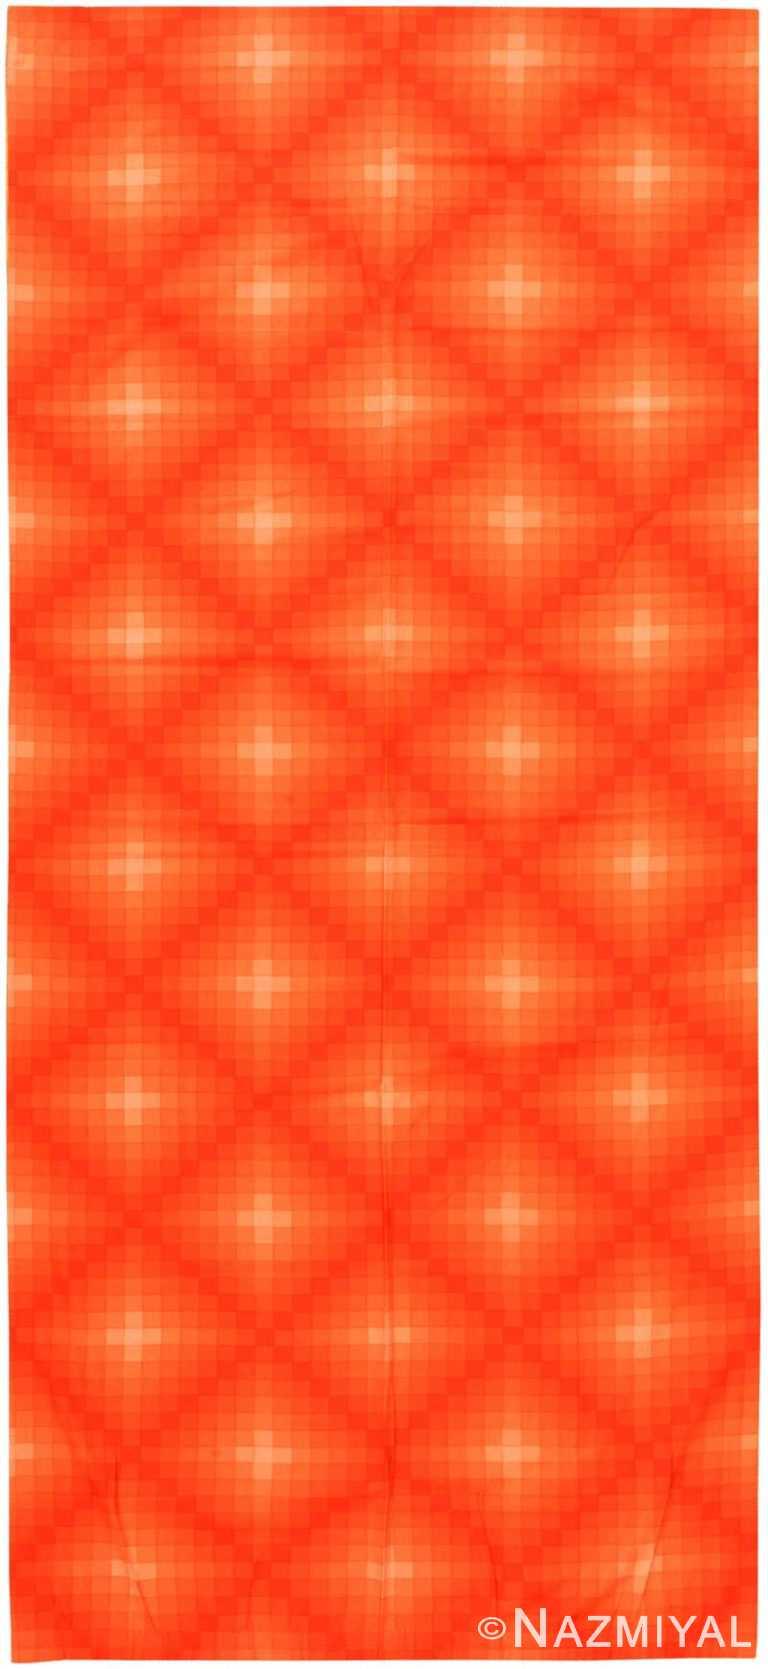 Vintage Scandinavian Verner Panton Checkers II Textile 47855 by Nazmiyal NYC